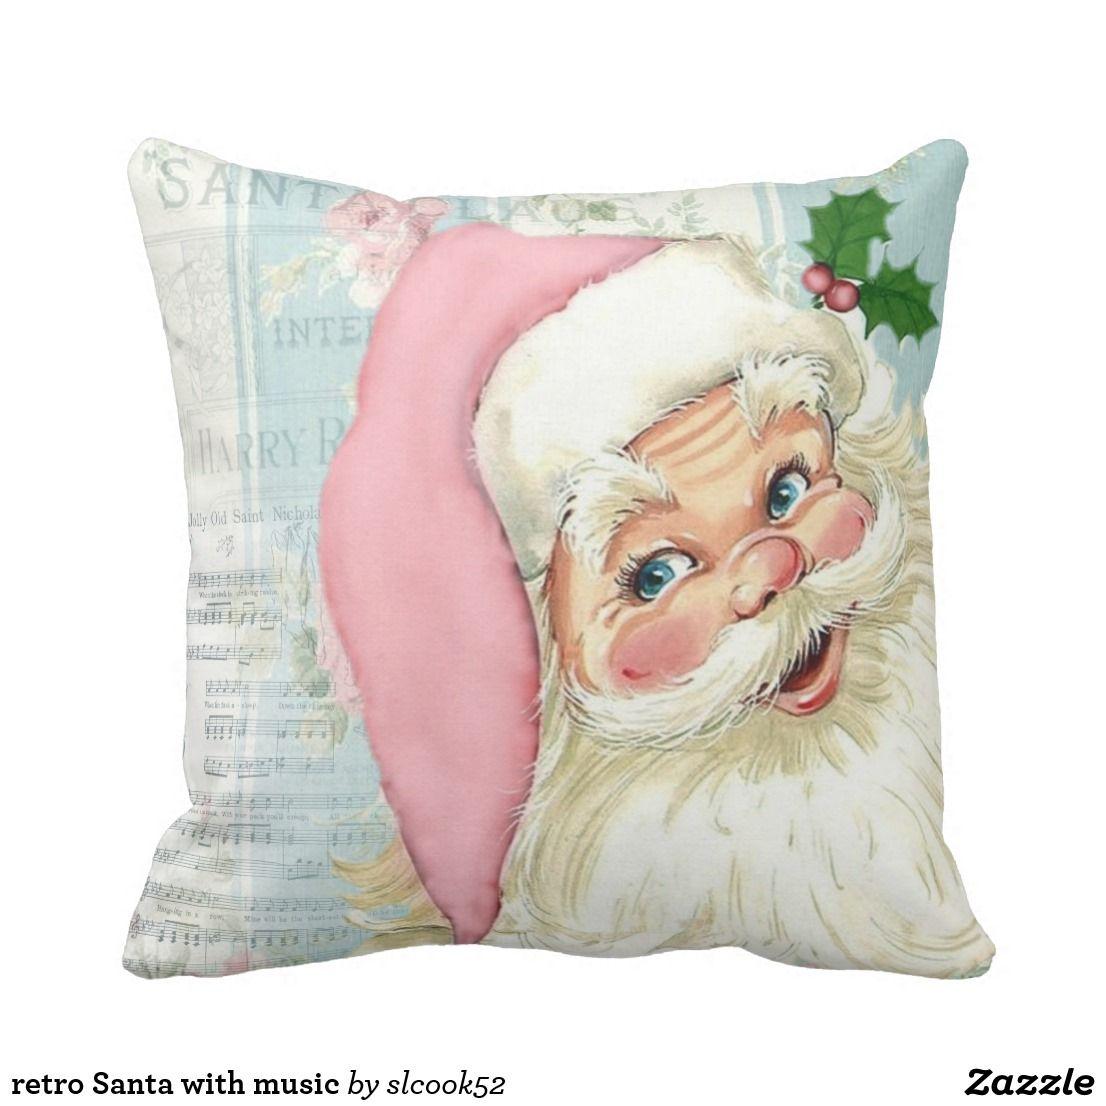 Retro Santa With Music Throw Pillow Zazzle Com Vintage Christmas Pillows Baby Prints Pillows